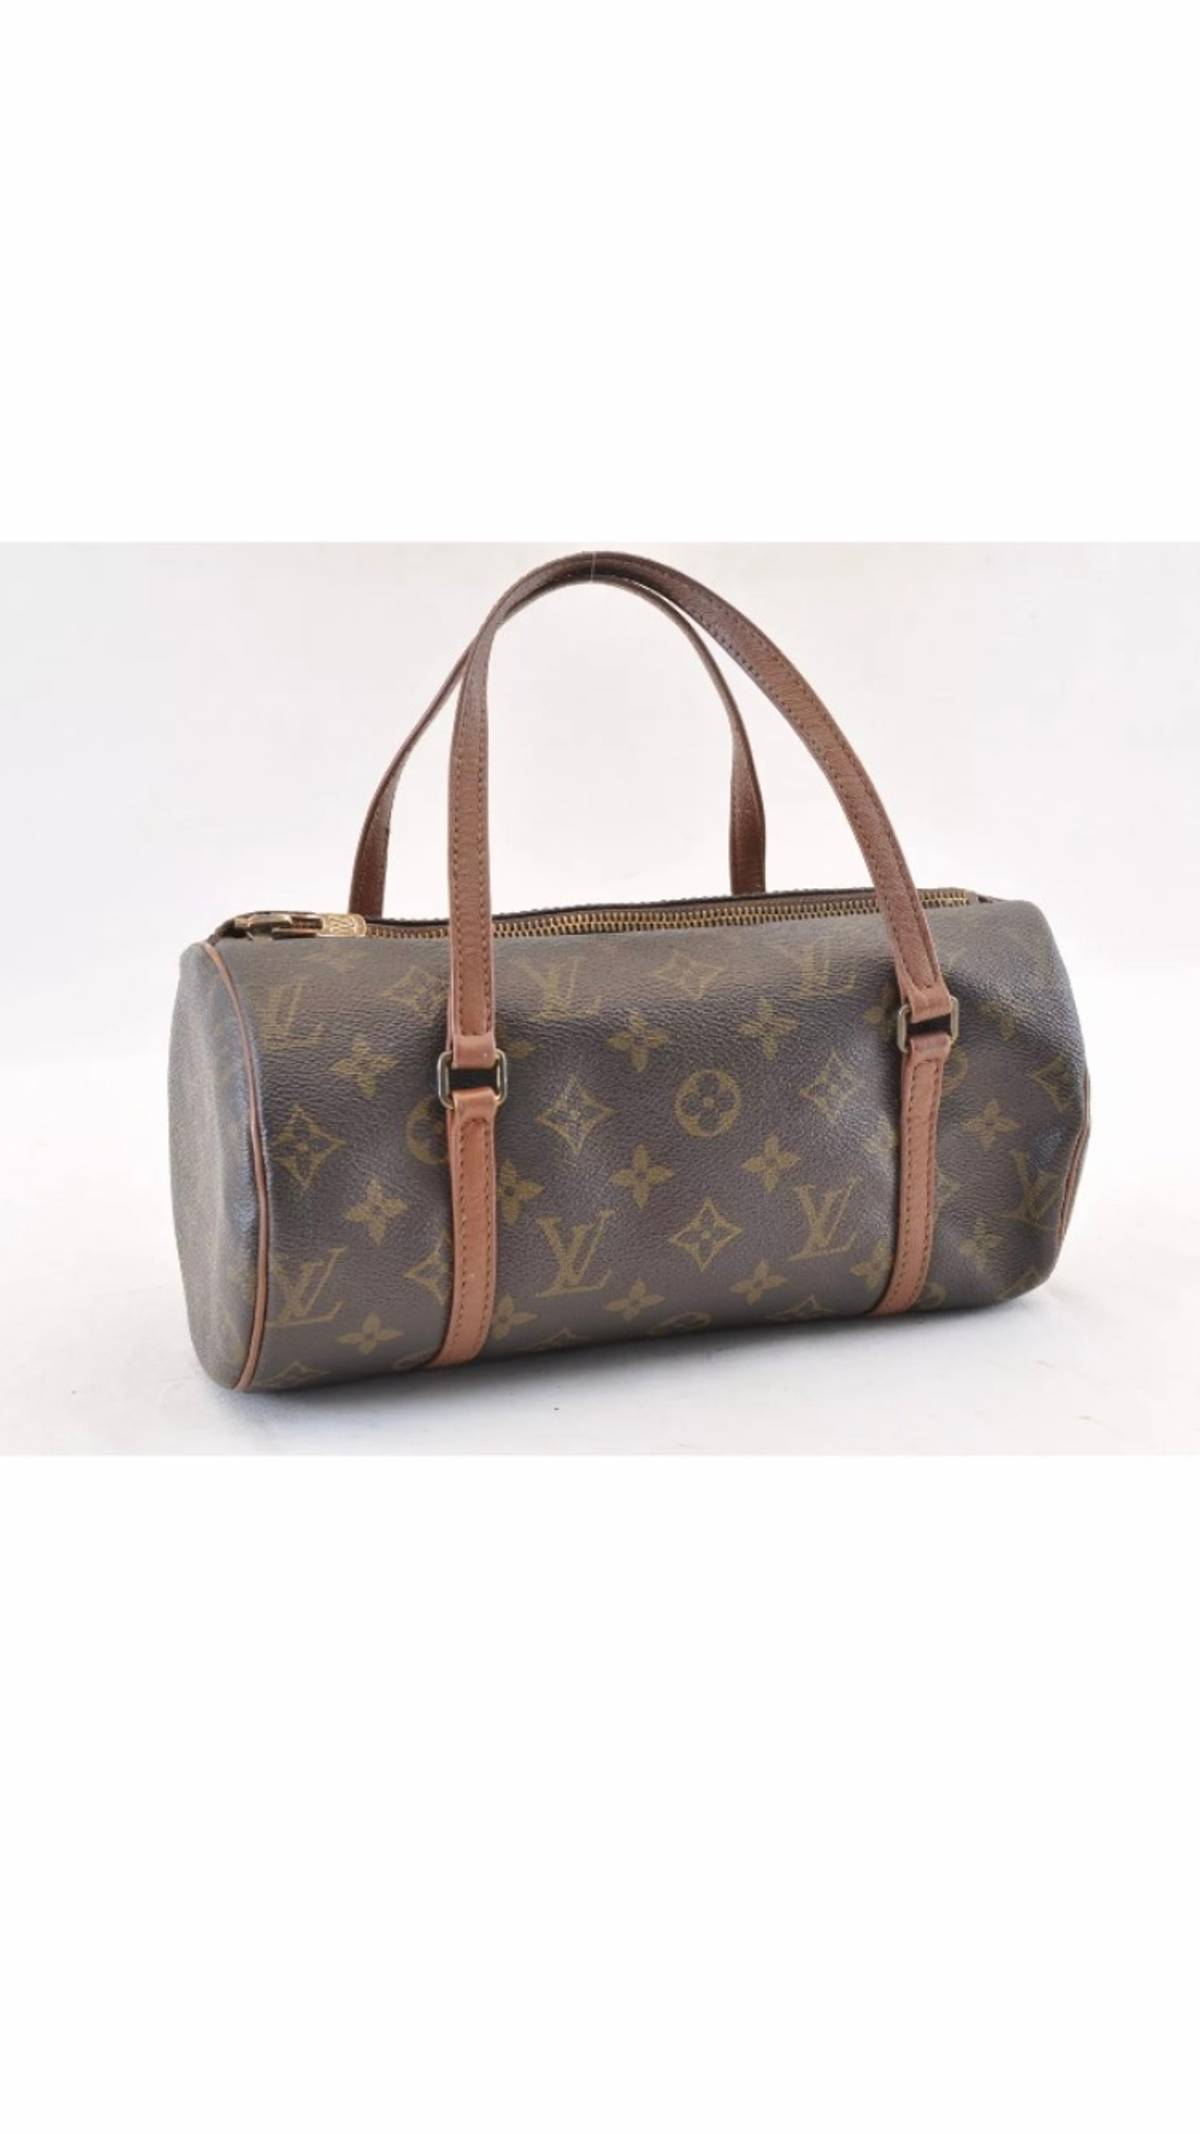 ba70babf1693 Louis Vuitton ×.  STEAL!  Louis Vuitton Mini Duffle Bag